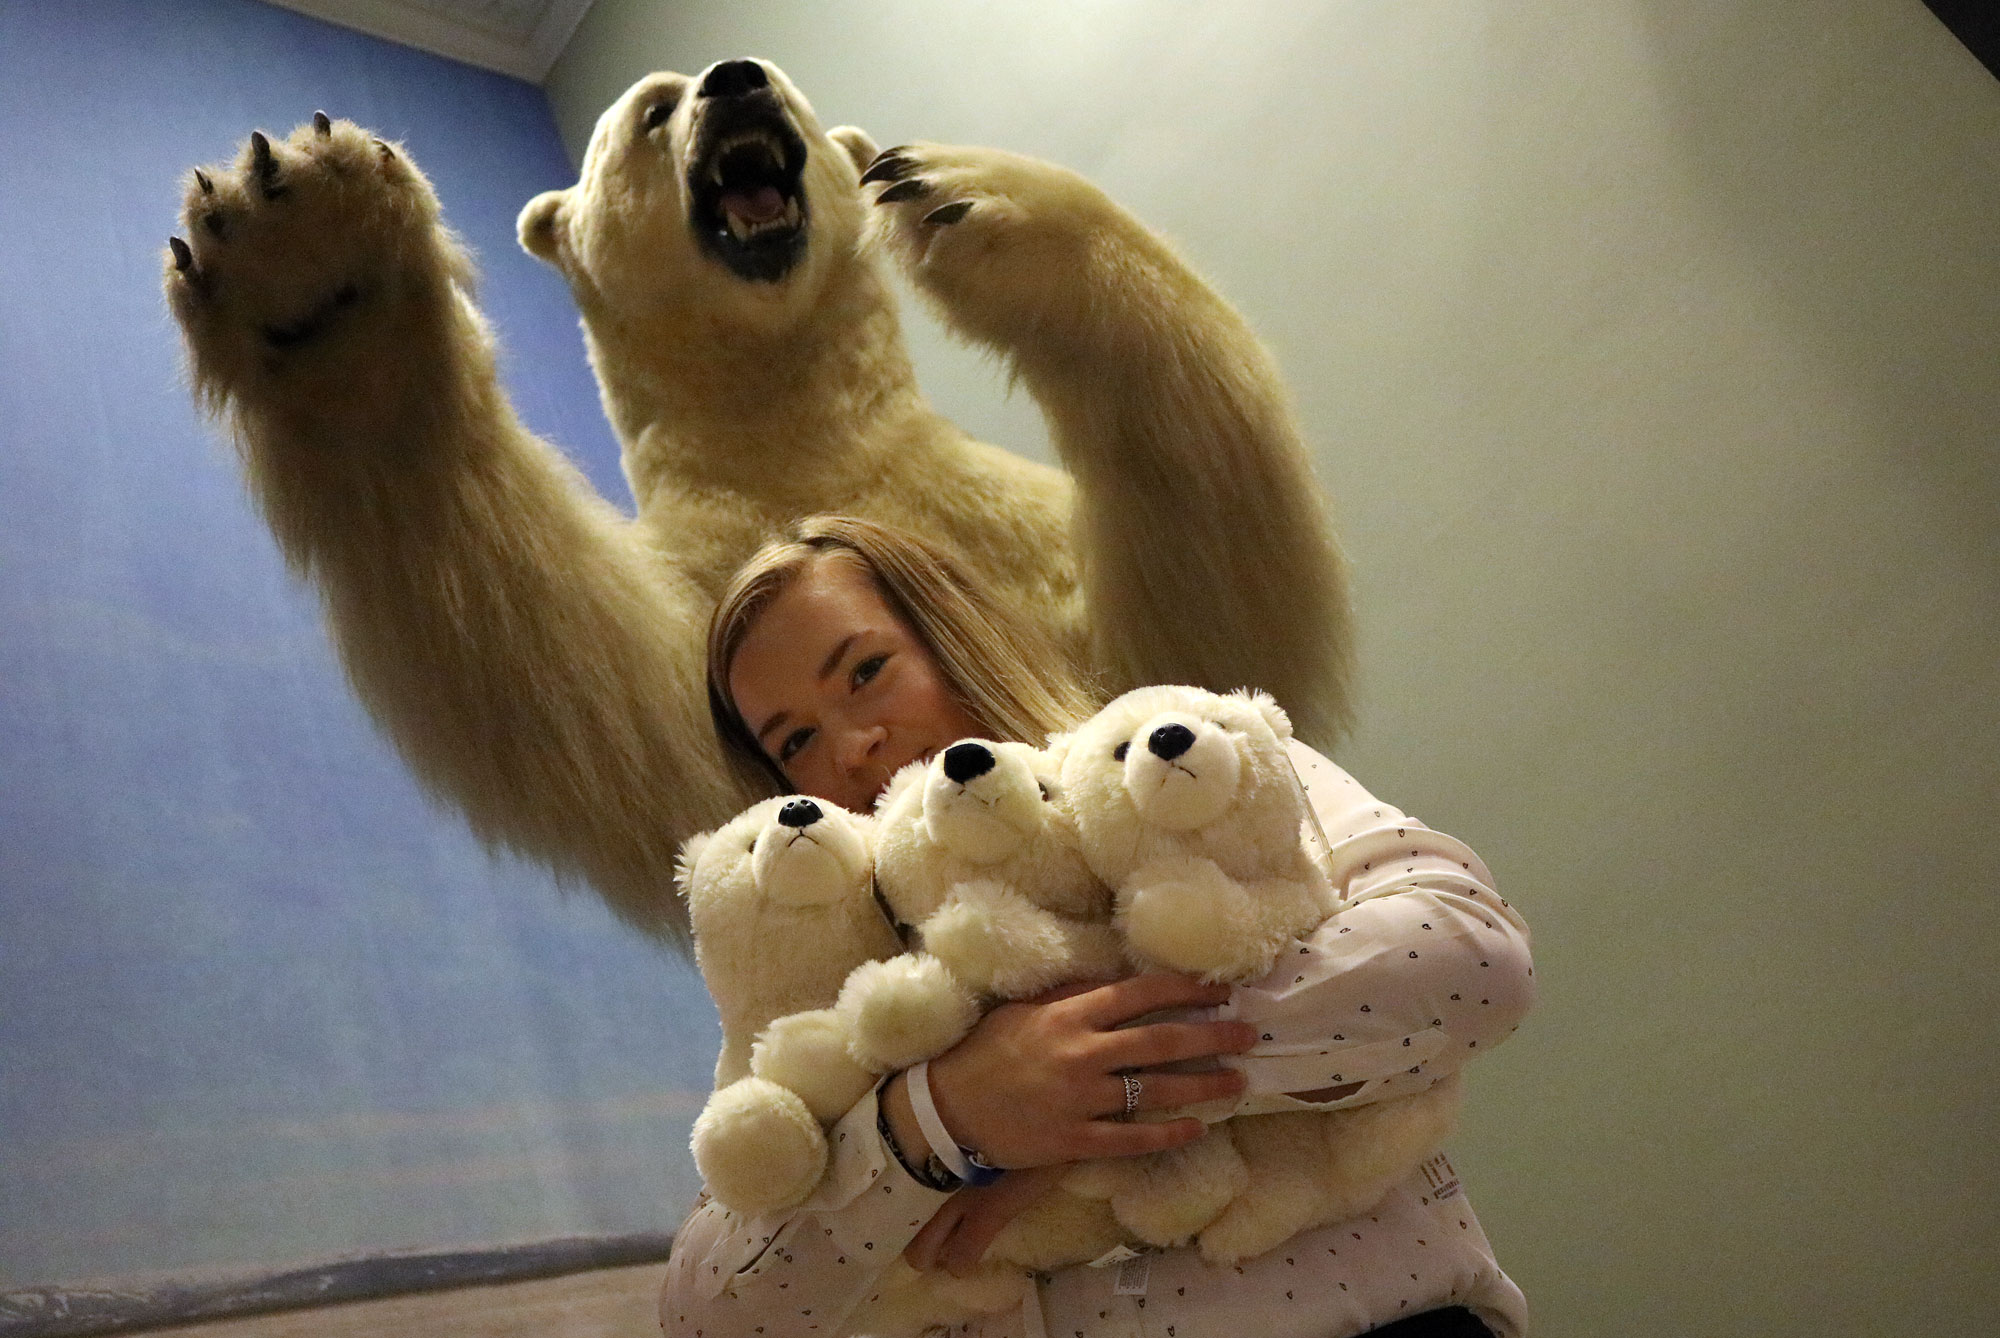 Young woman holds three plush polar bears under fierce-looking taxidermy polar bear